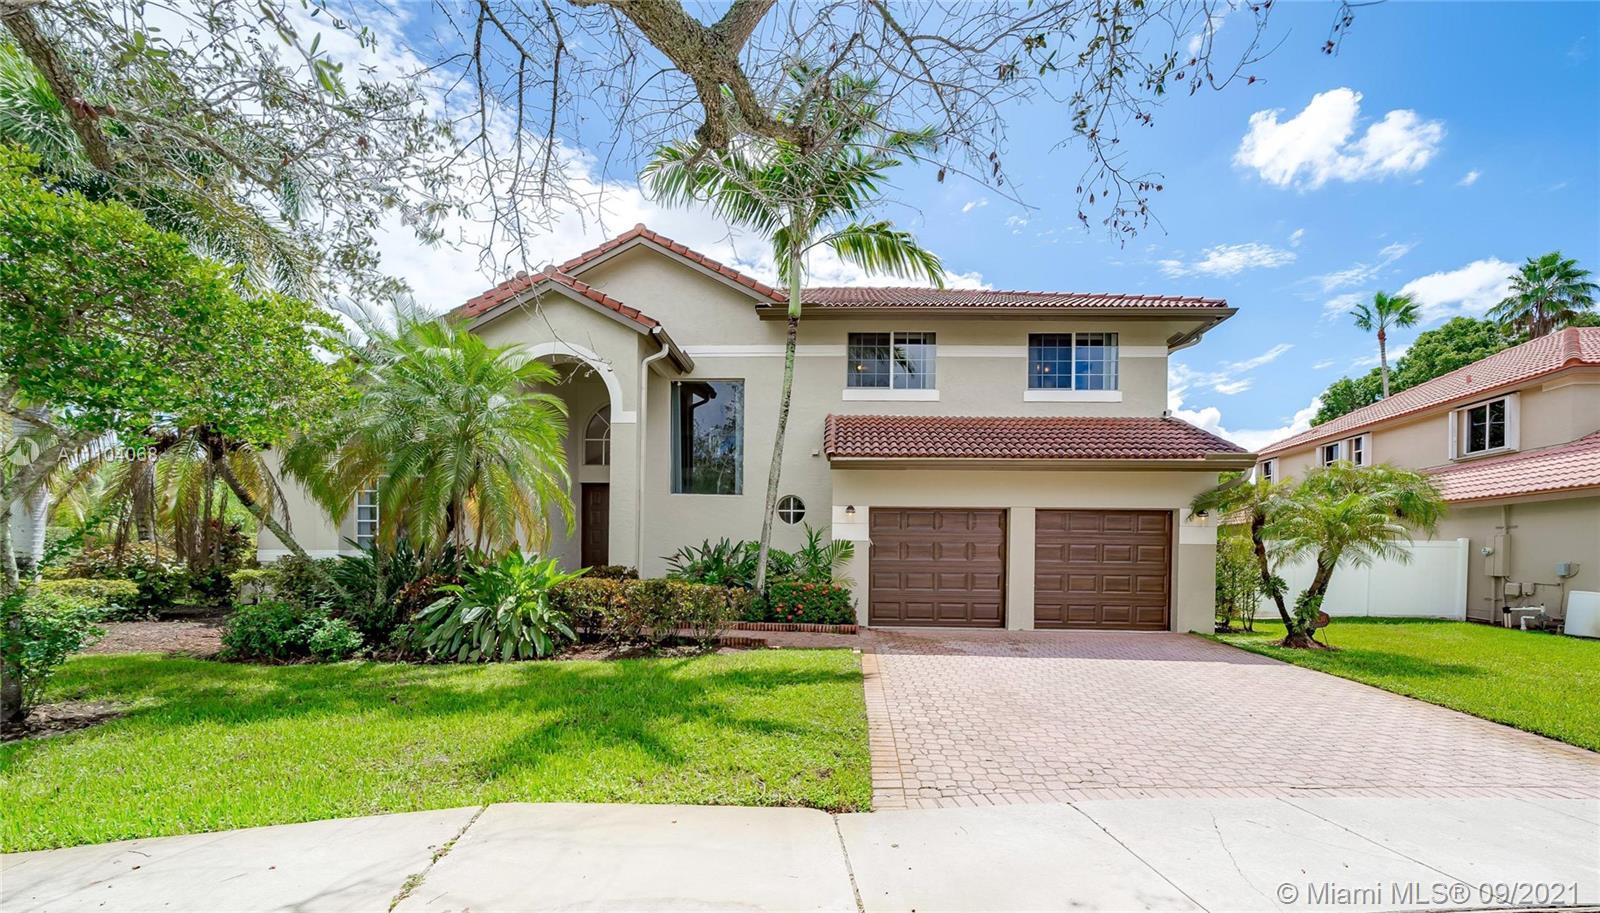 1231 179th Ave, Pembroke Pines, Florida 33029